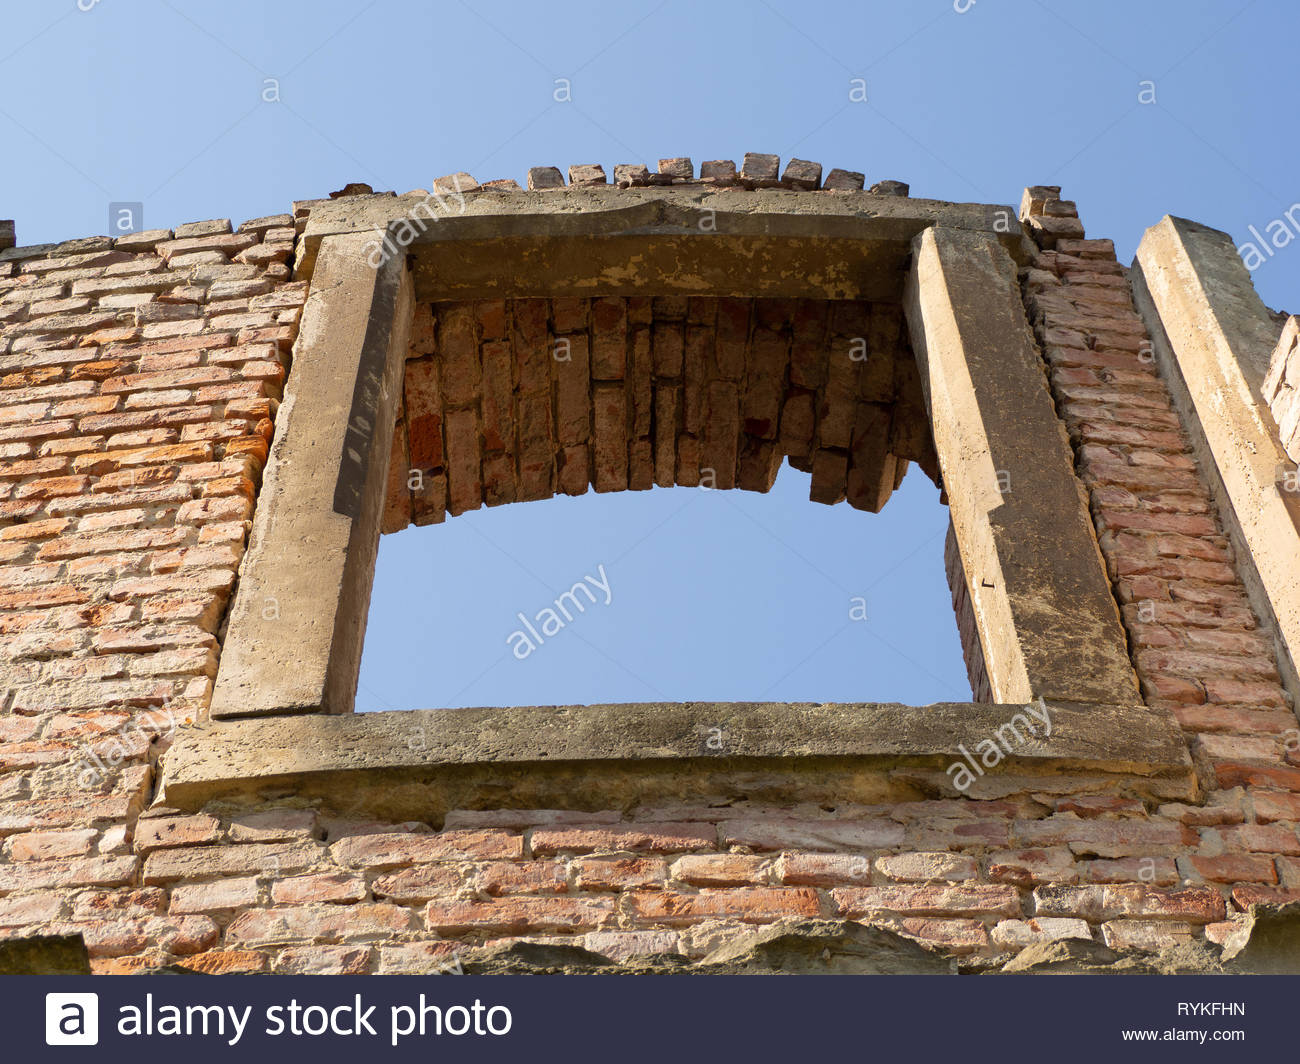 OLYMPUS DIGITAL CAMERA - Stock Image